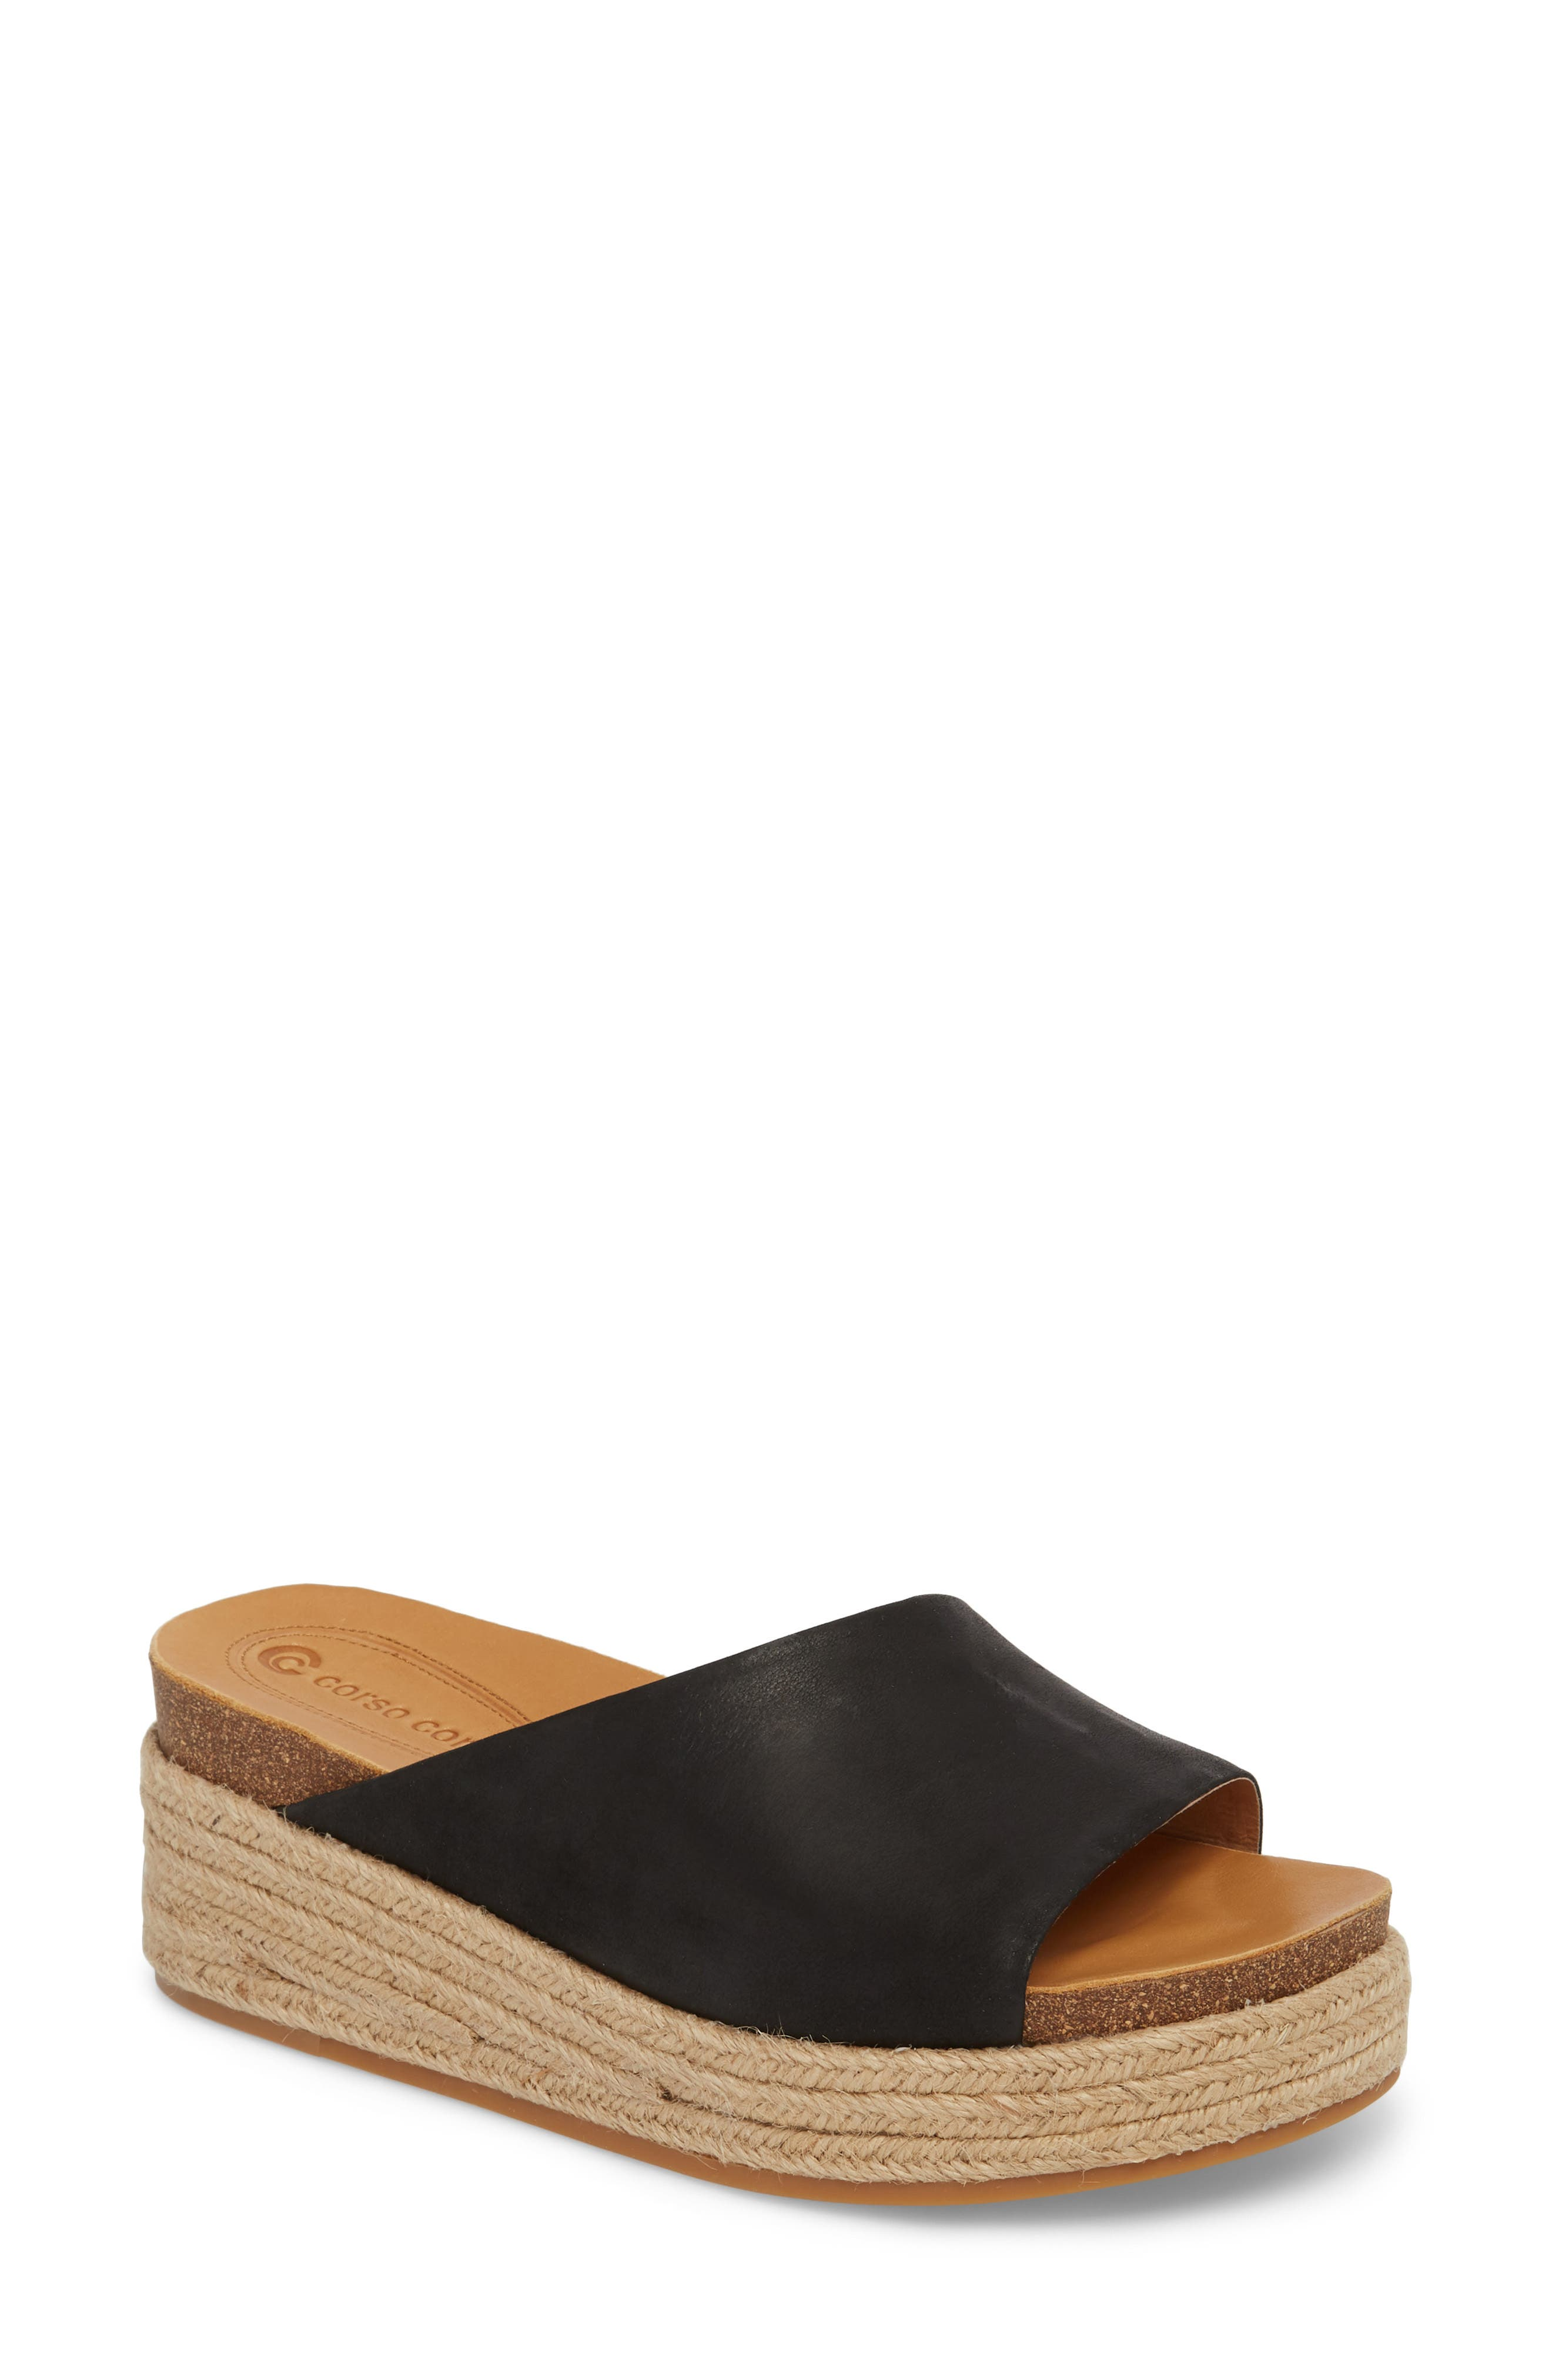 Candice Sandal,                             Main thumbnail 1, color,                             Black Leather